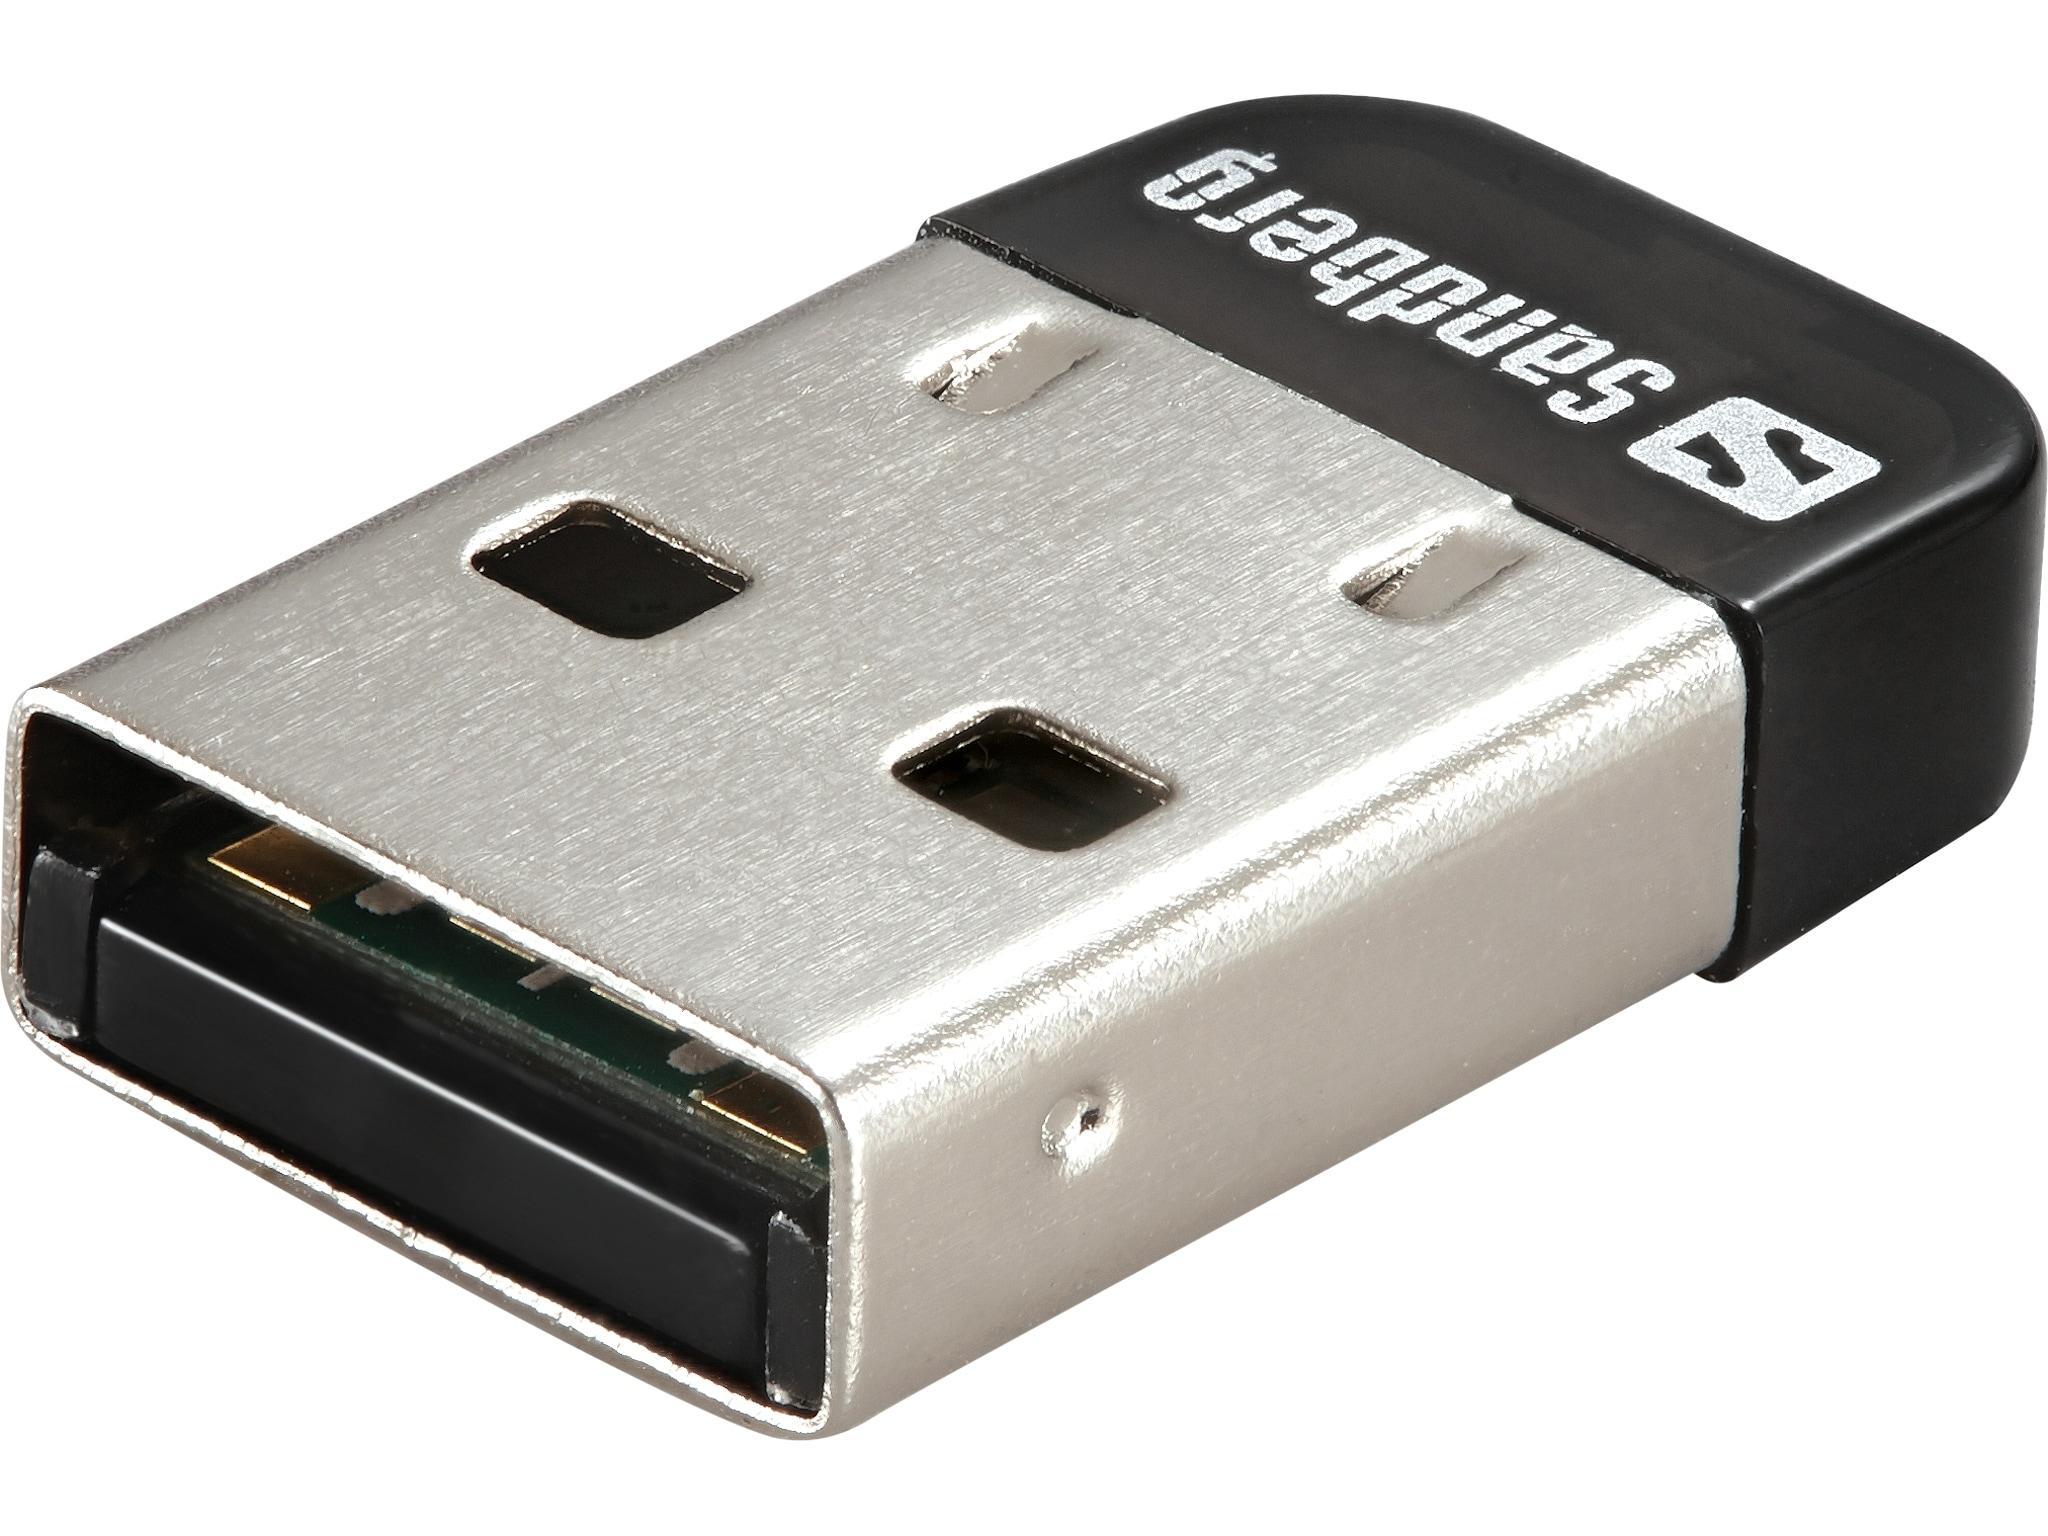 Sandberg Nano Bluetooth 4.0 Dongle - 1